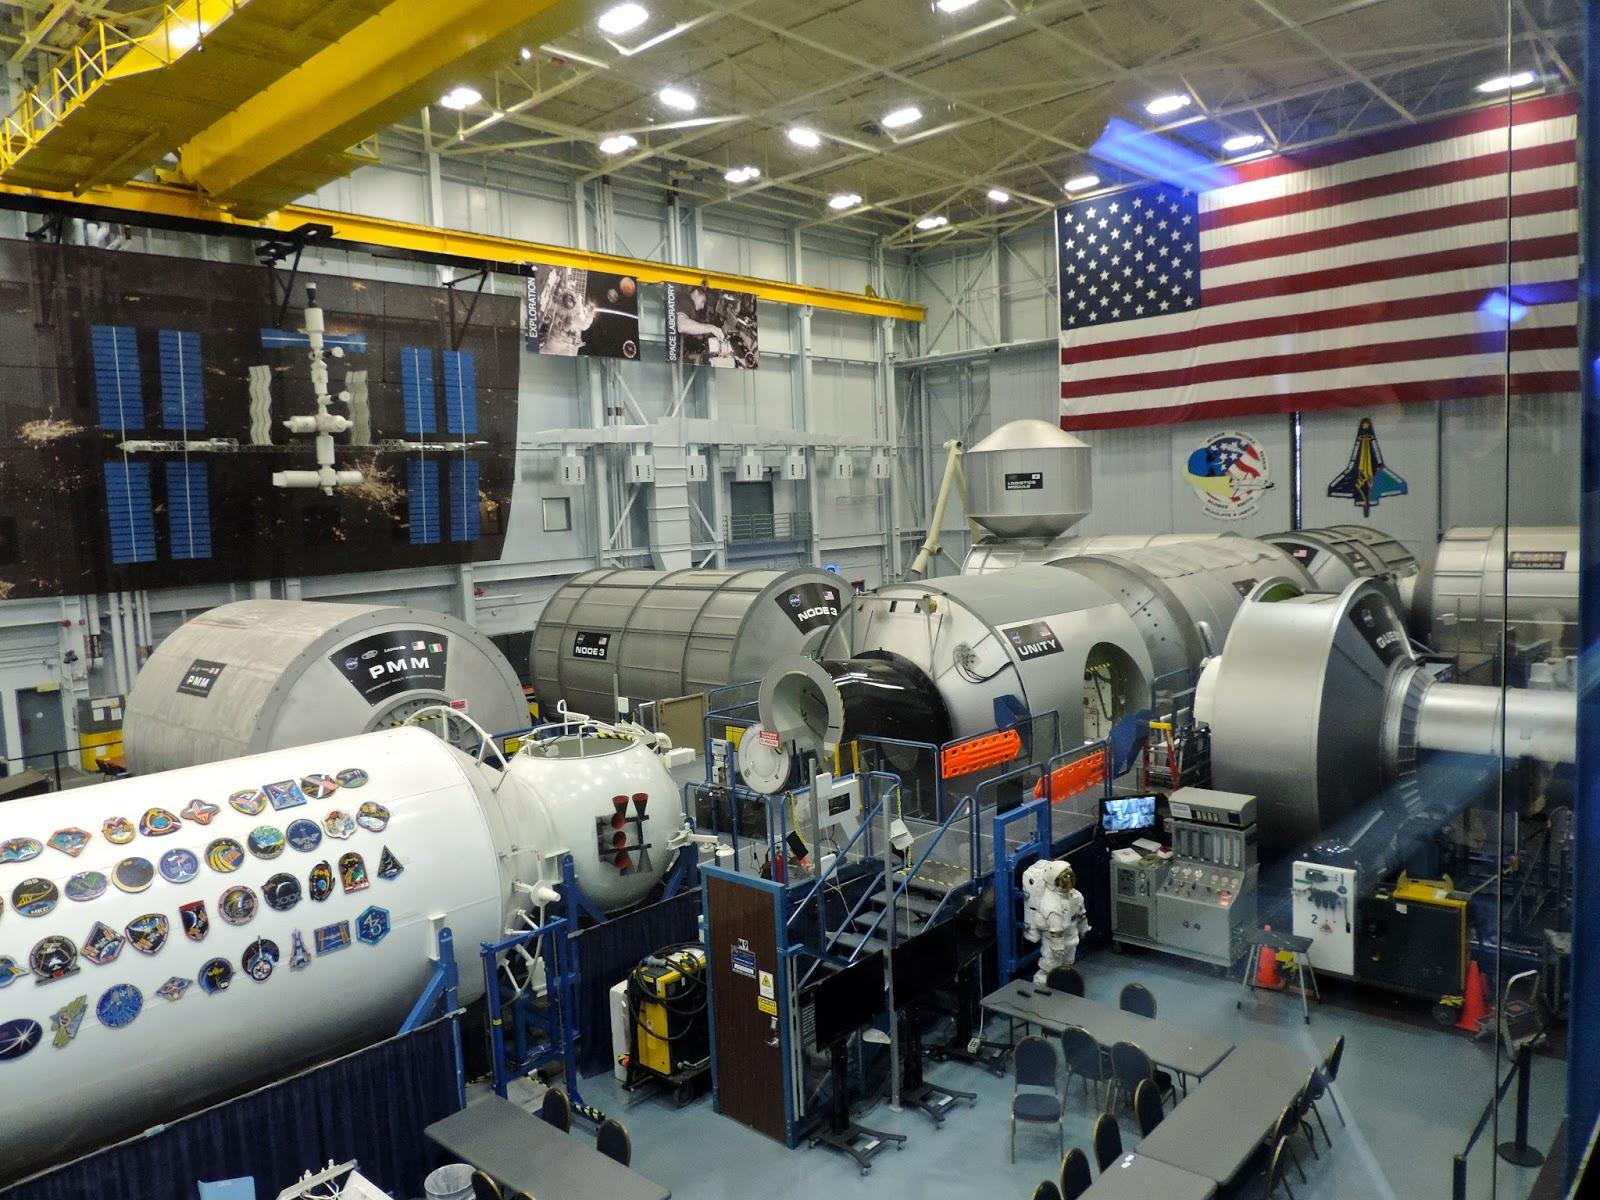 nasa johnson space center history - HD1600×1200